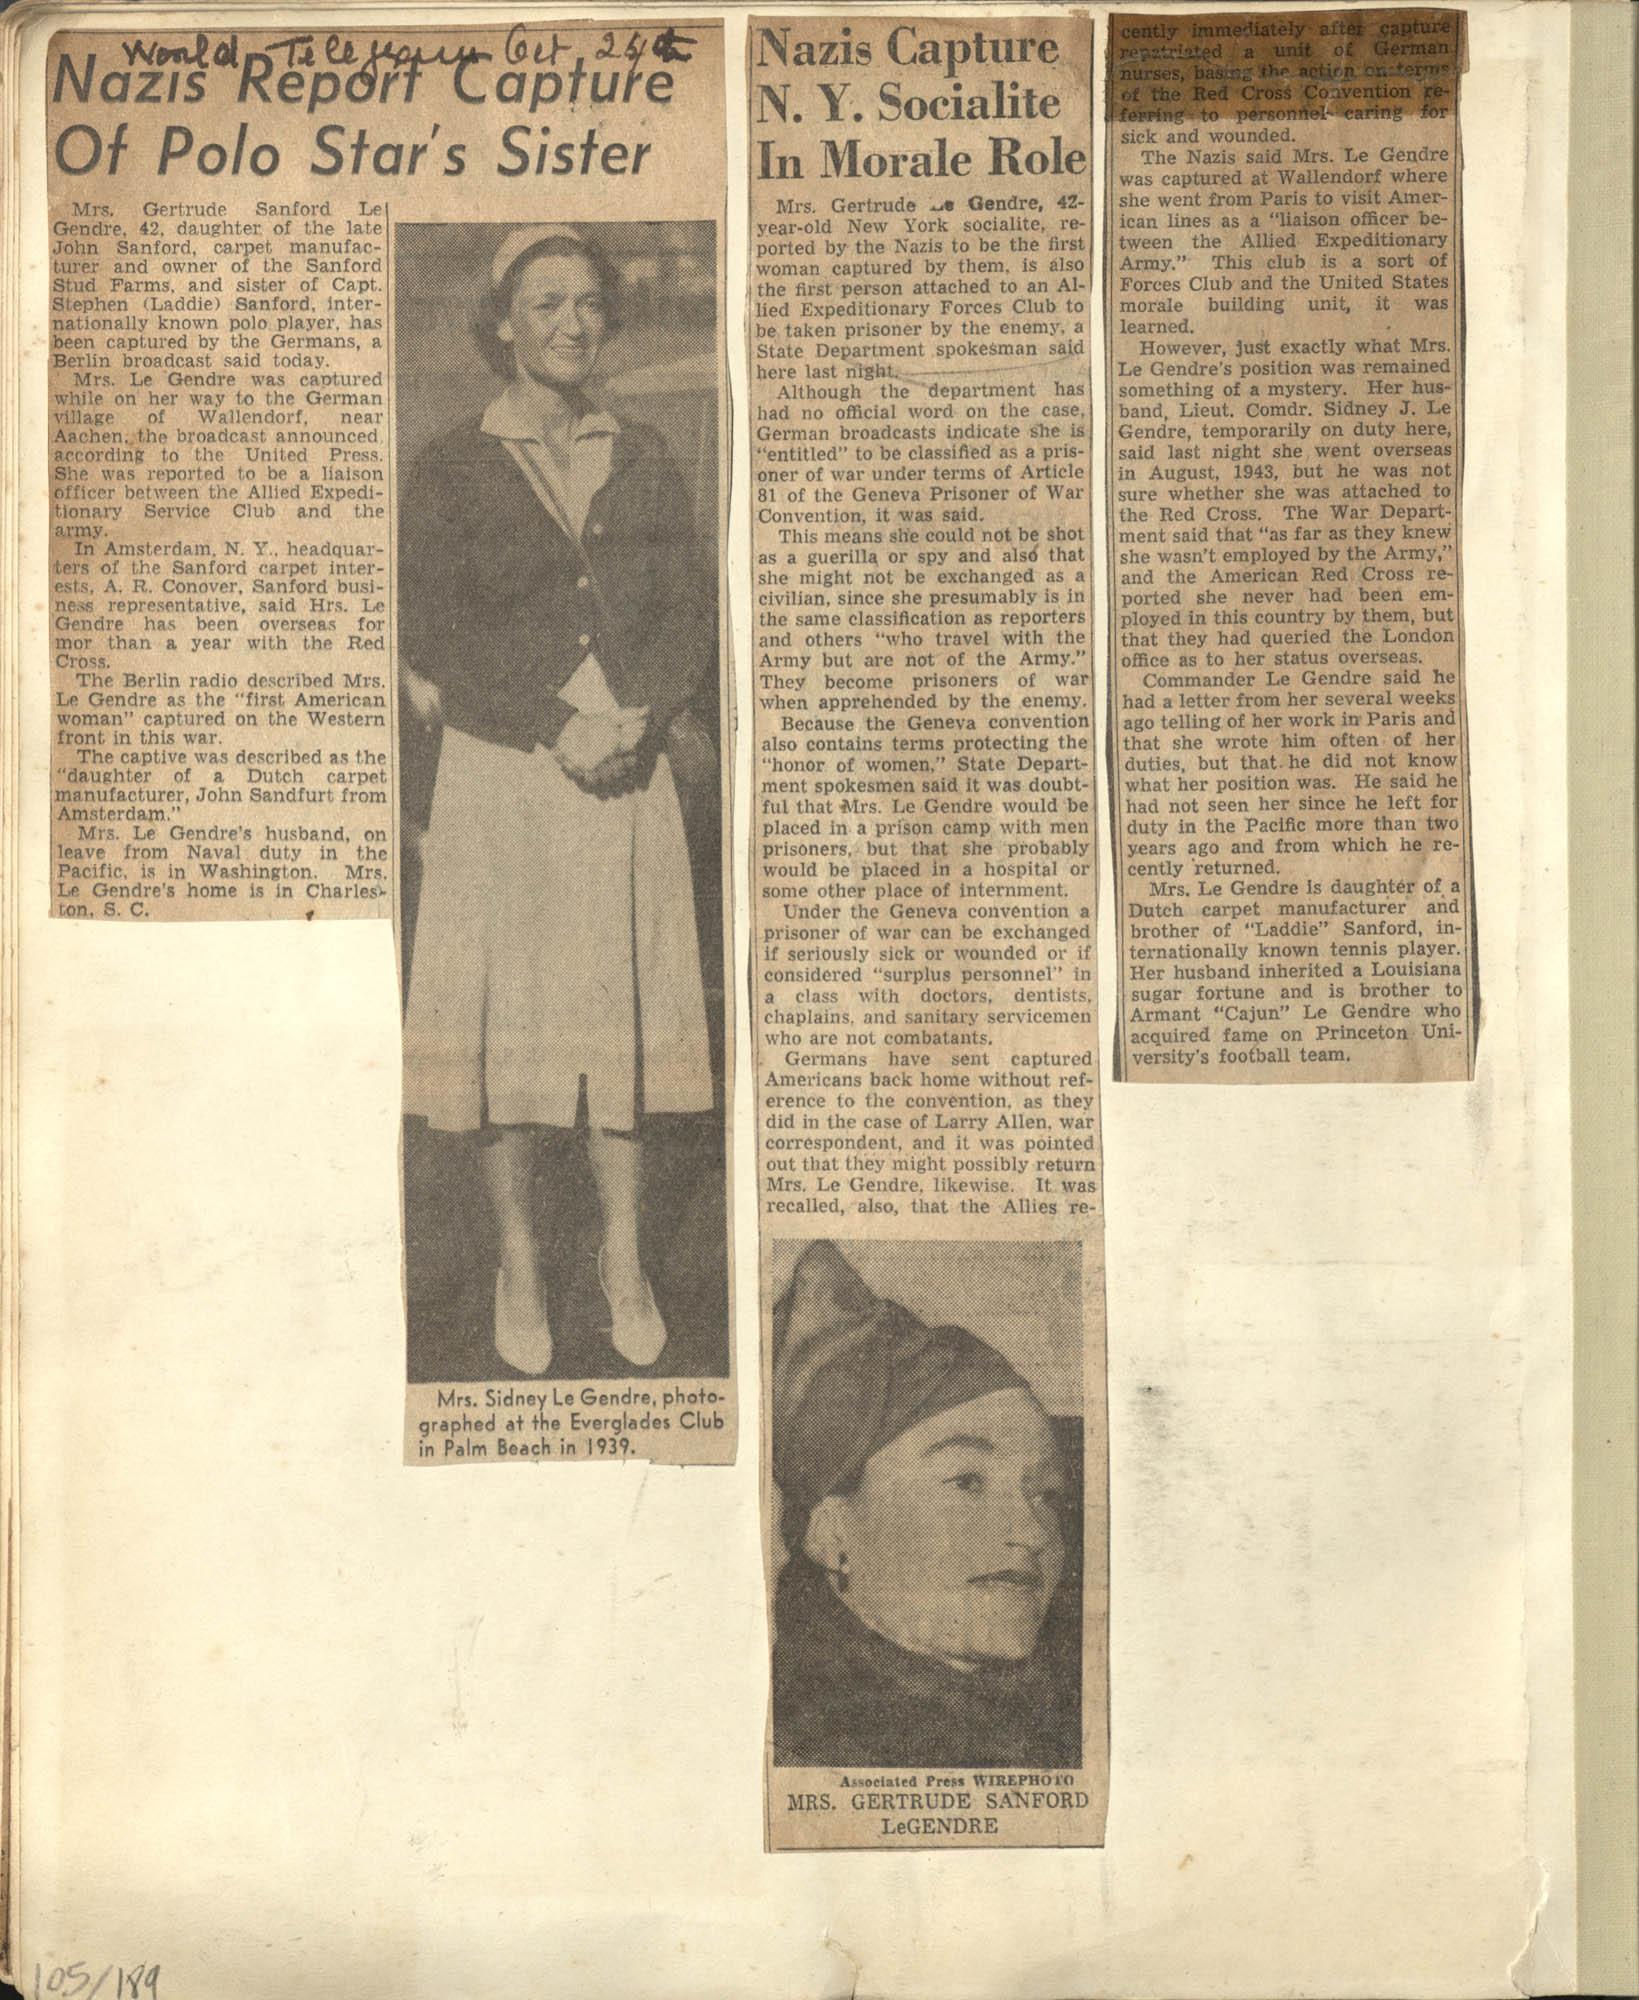 Gertrude Legendre OSS Scrapbook, 1944, Page 105